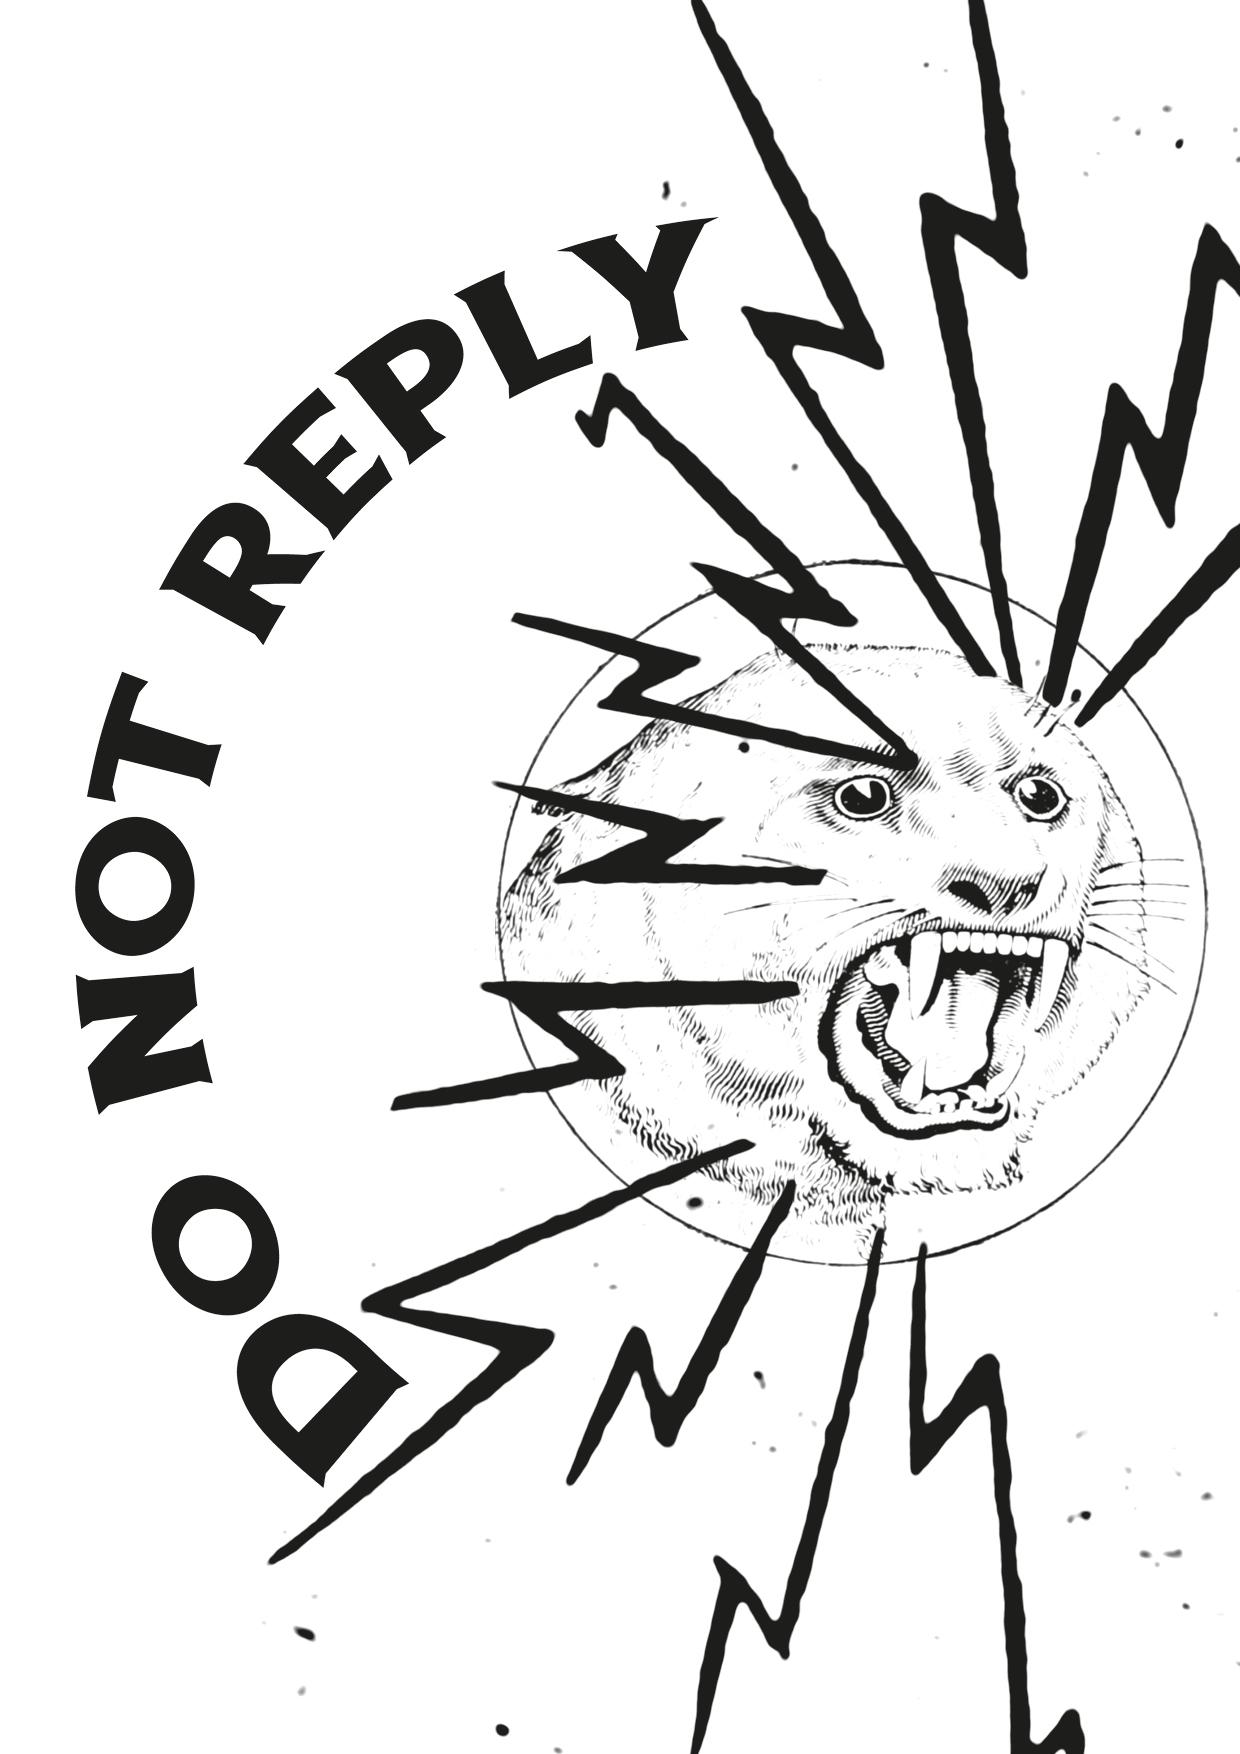 Unsubscribe-print-typography-design-James-Lee-Duffy17.jpg